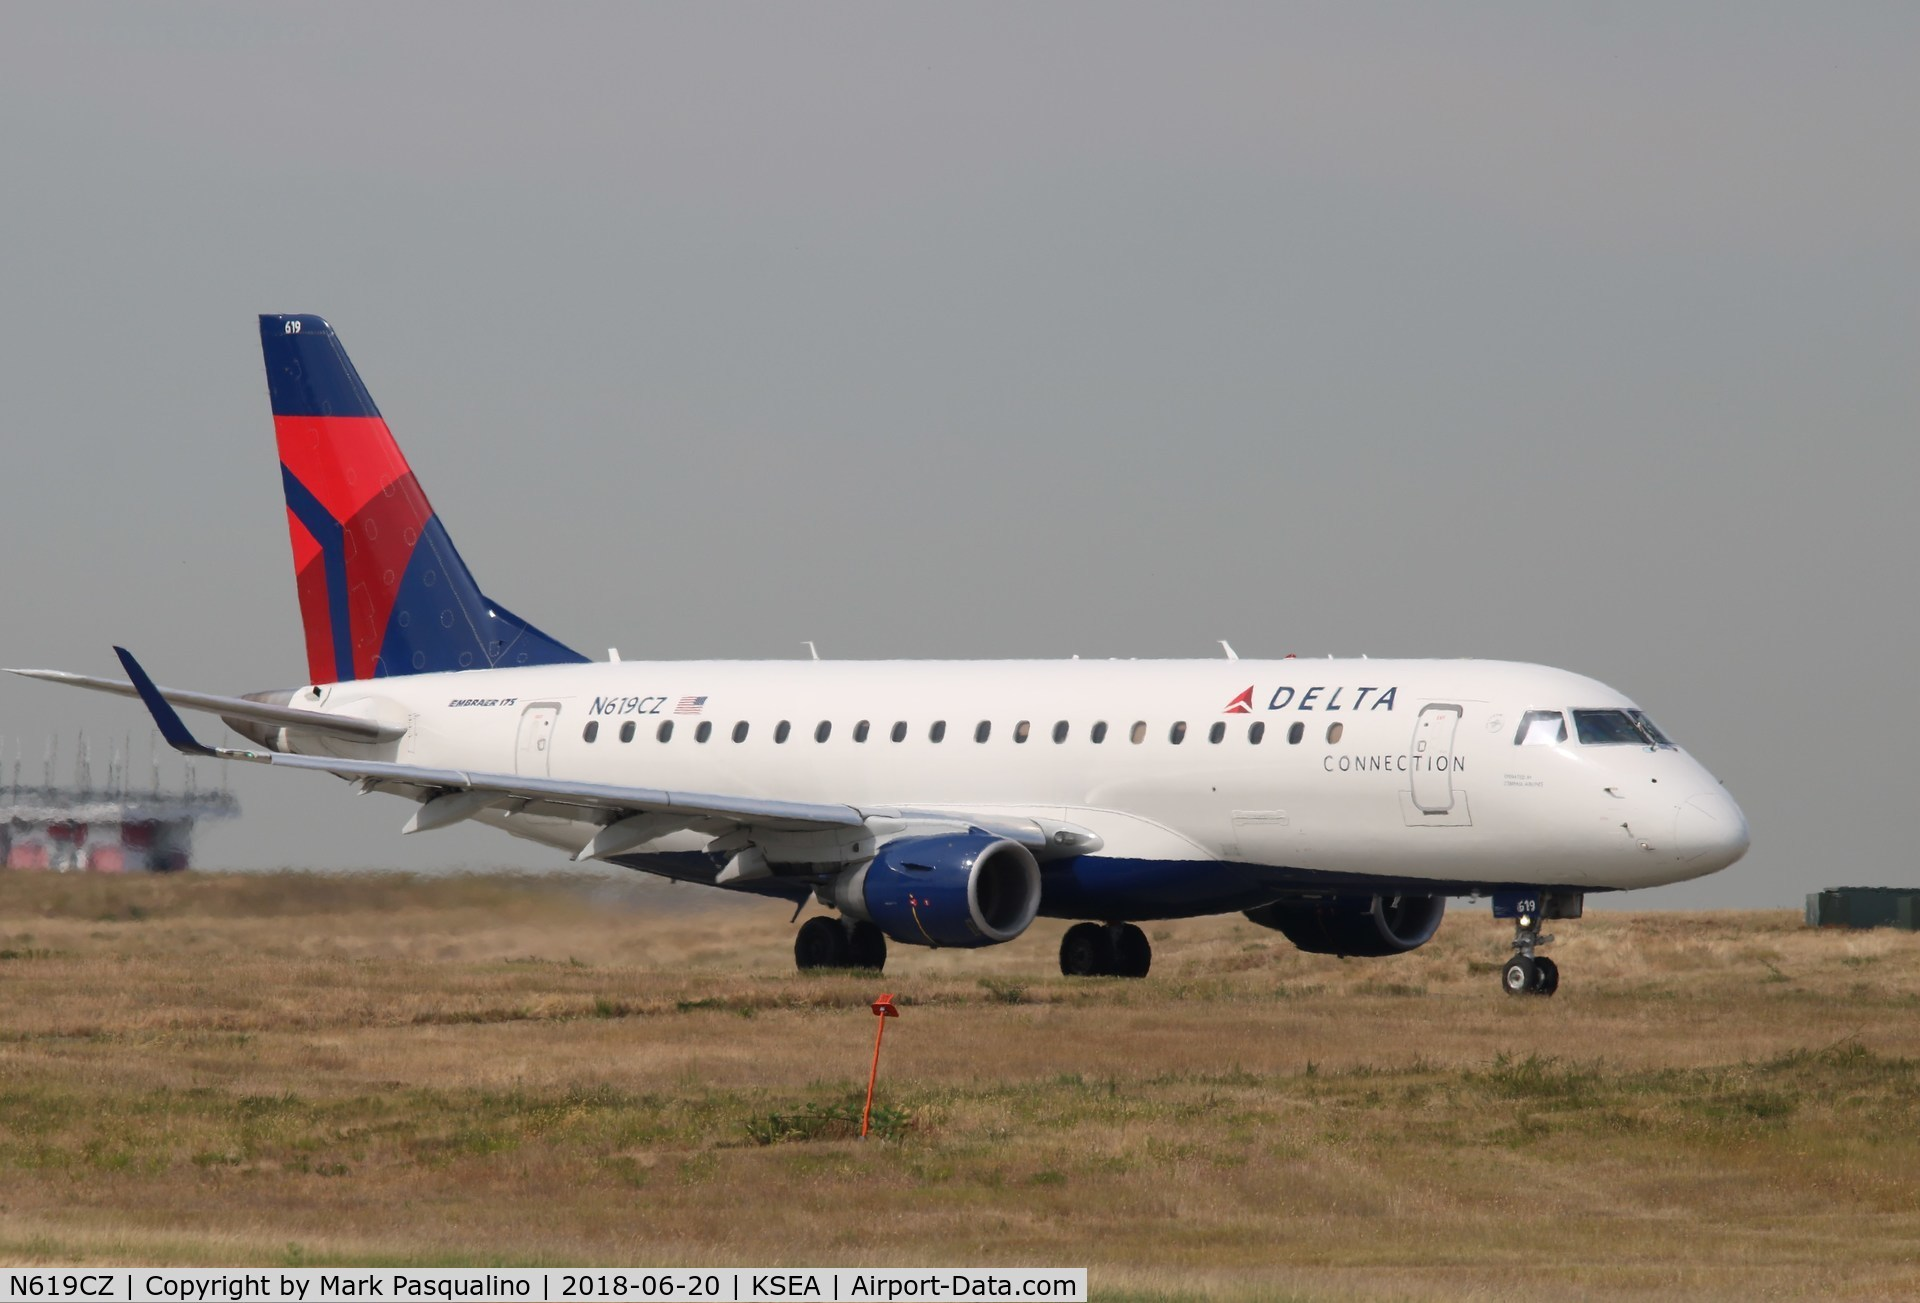 N619CZ, 2008 Embraer 175LR (ERJ-170-200LR) C/N 17000213, ERJ 170-200 LR